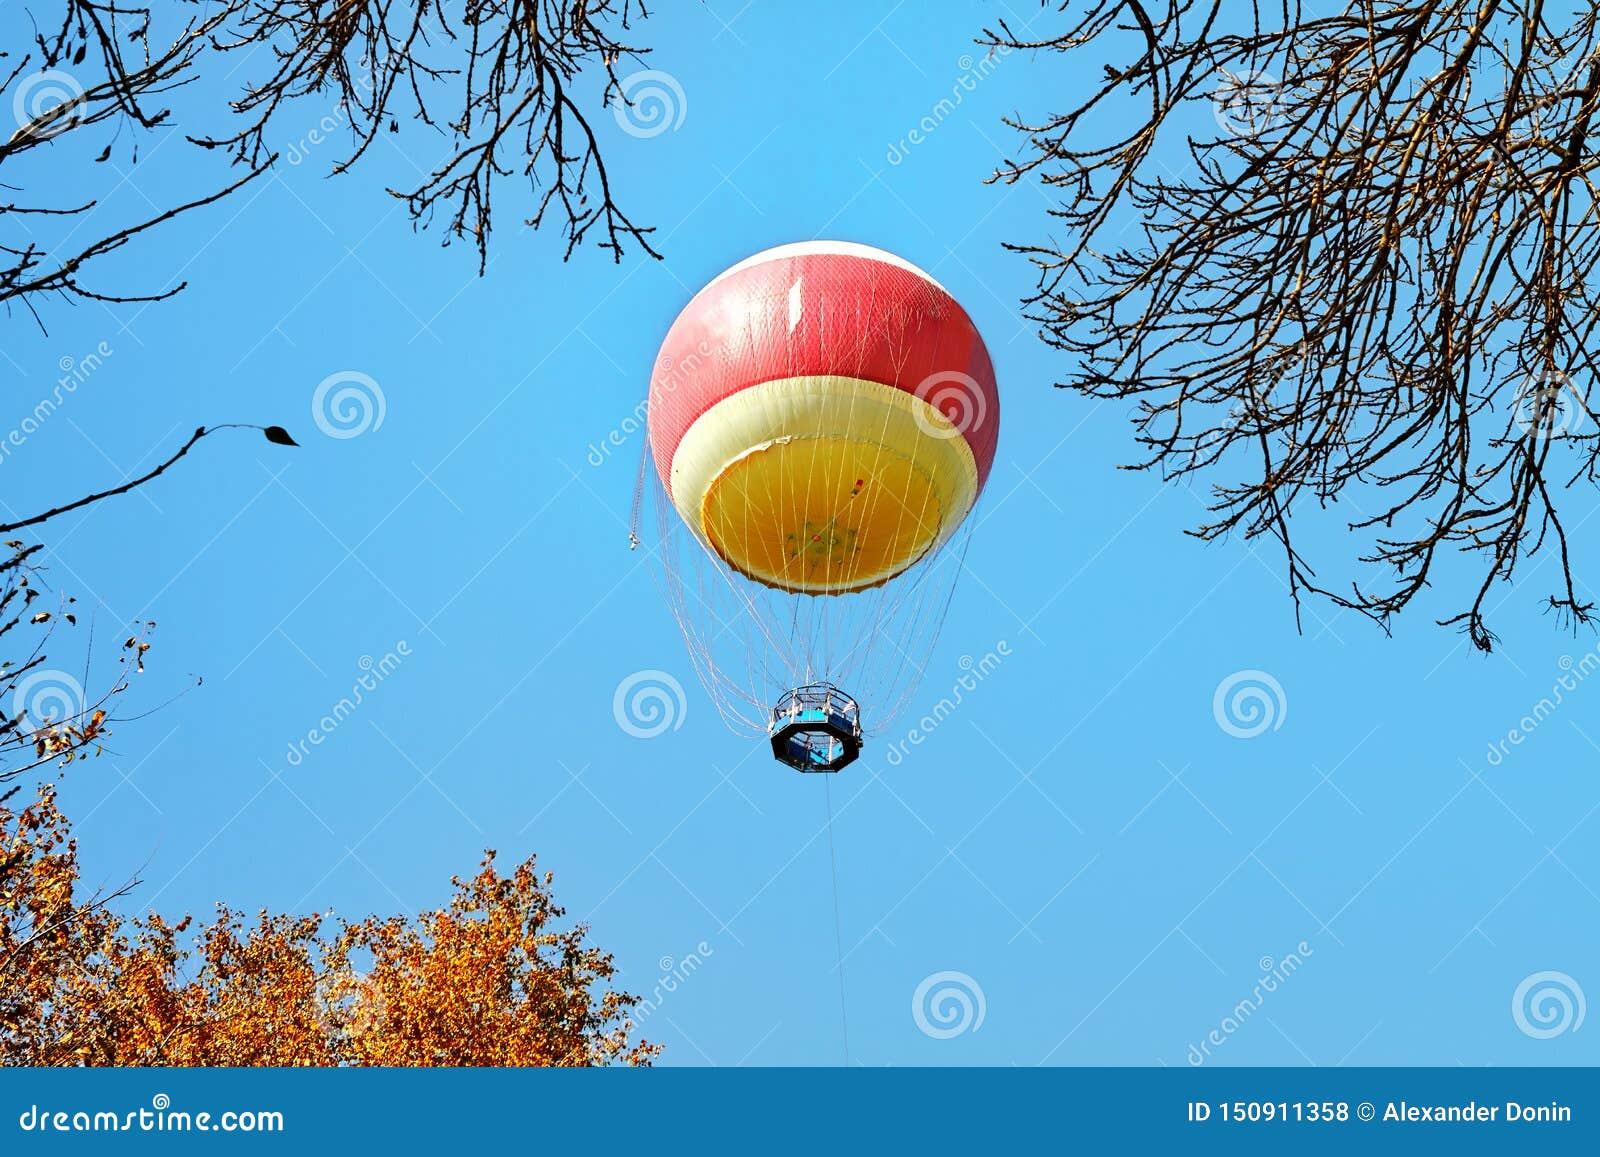 Воздушный шар в облаках над парком Yarkon, Тель-Авив